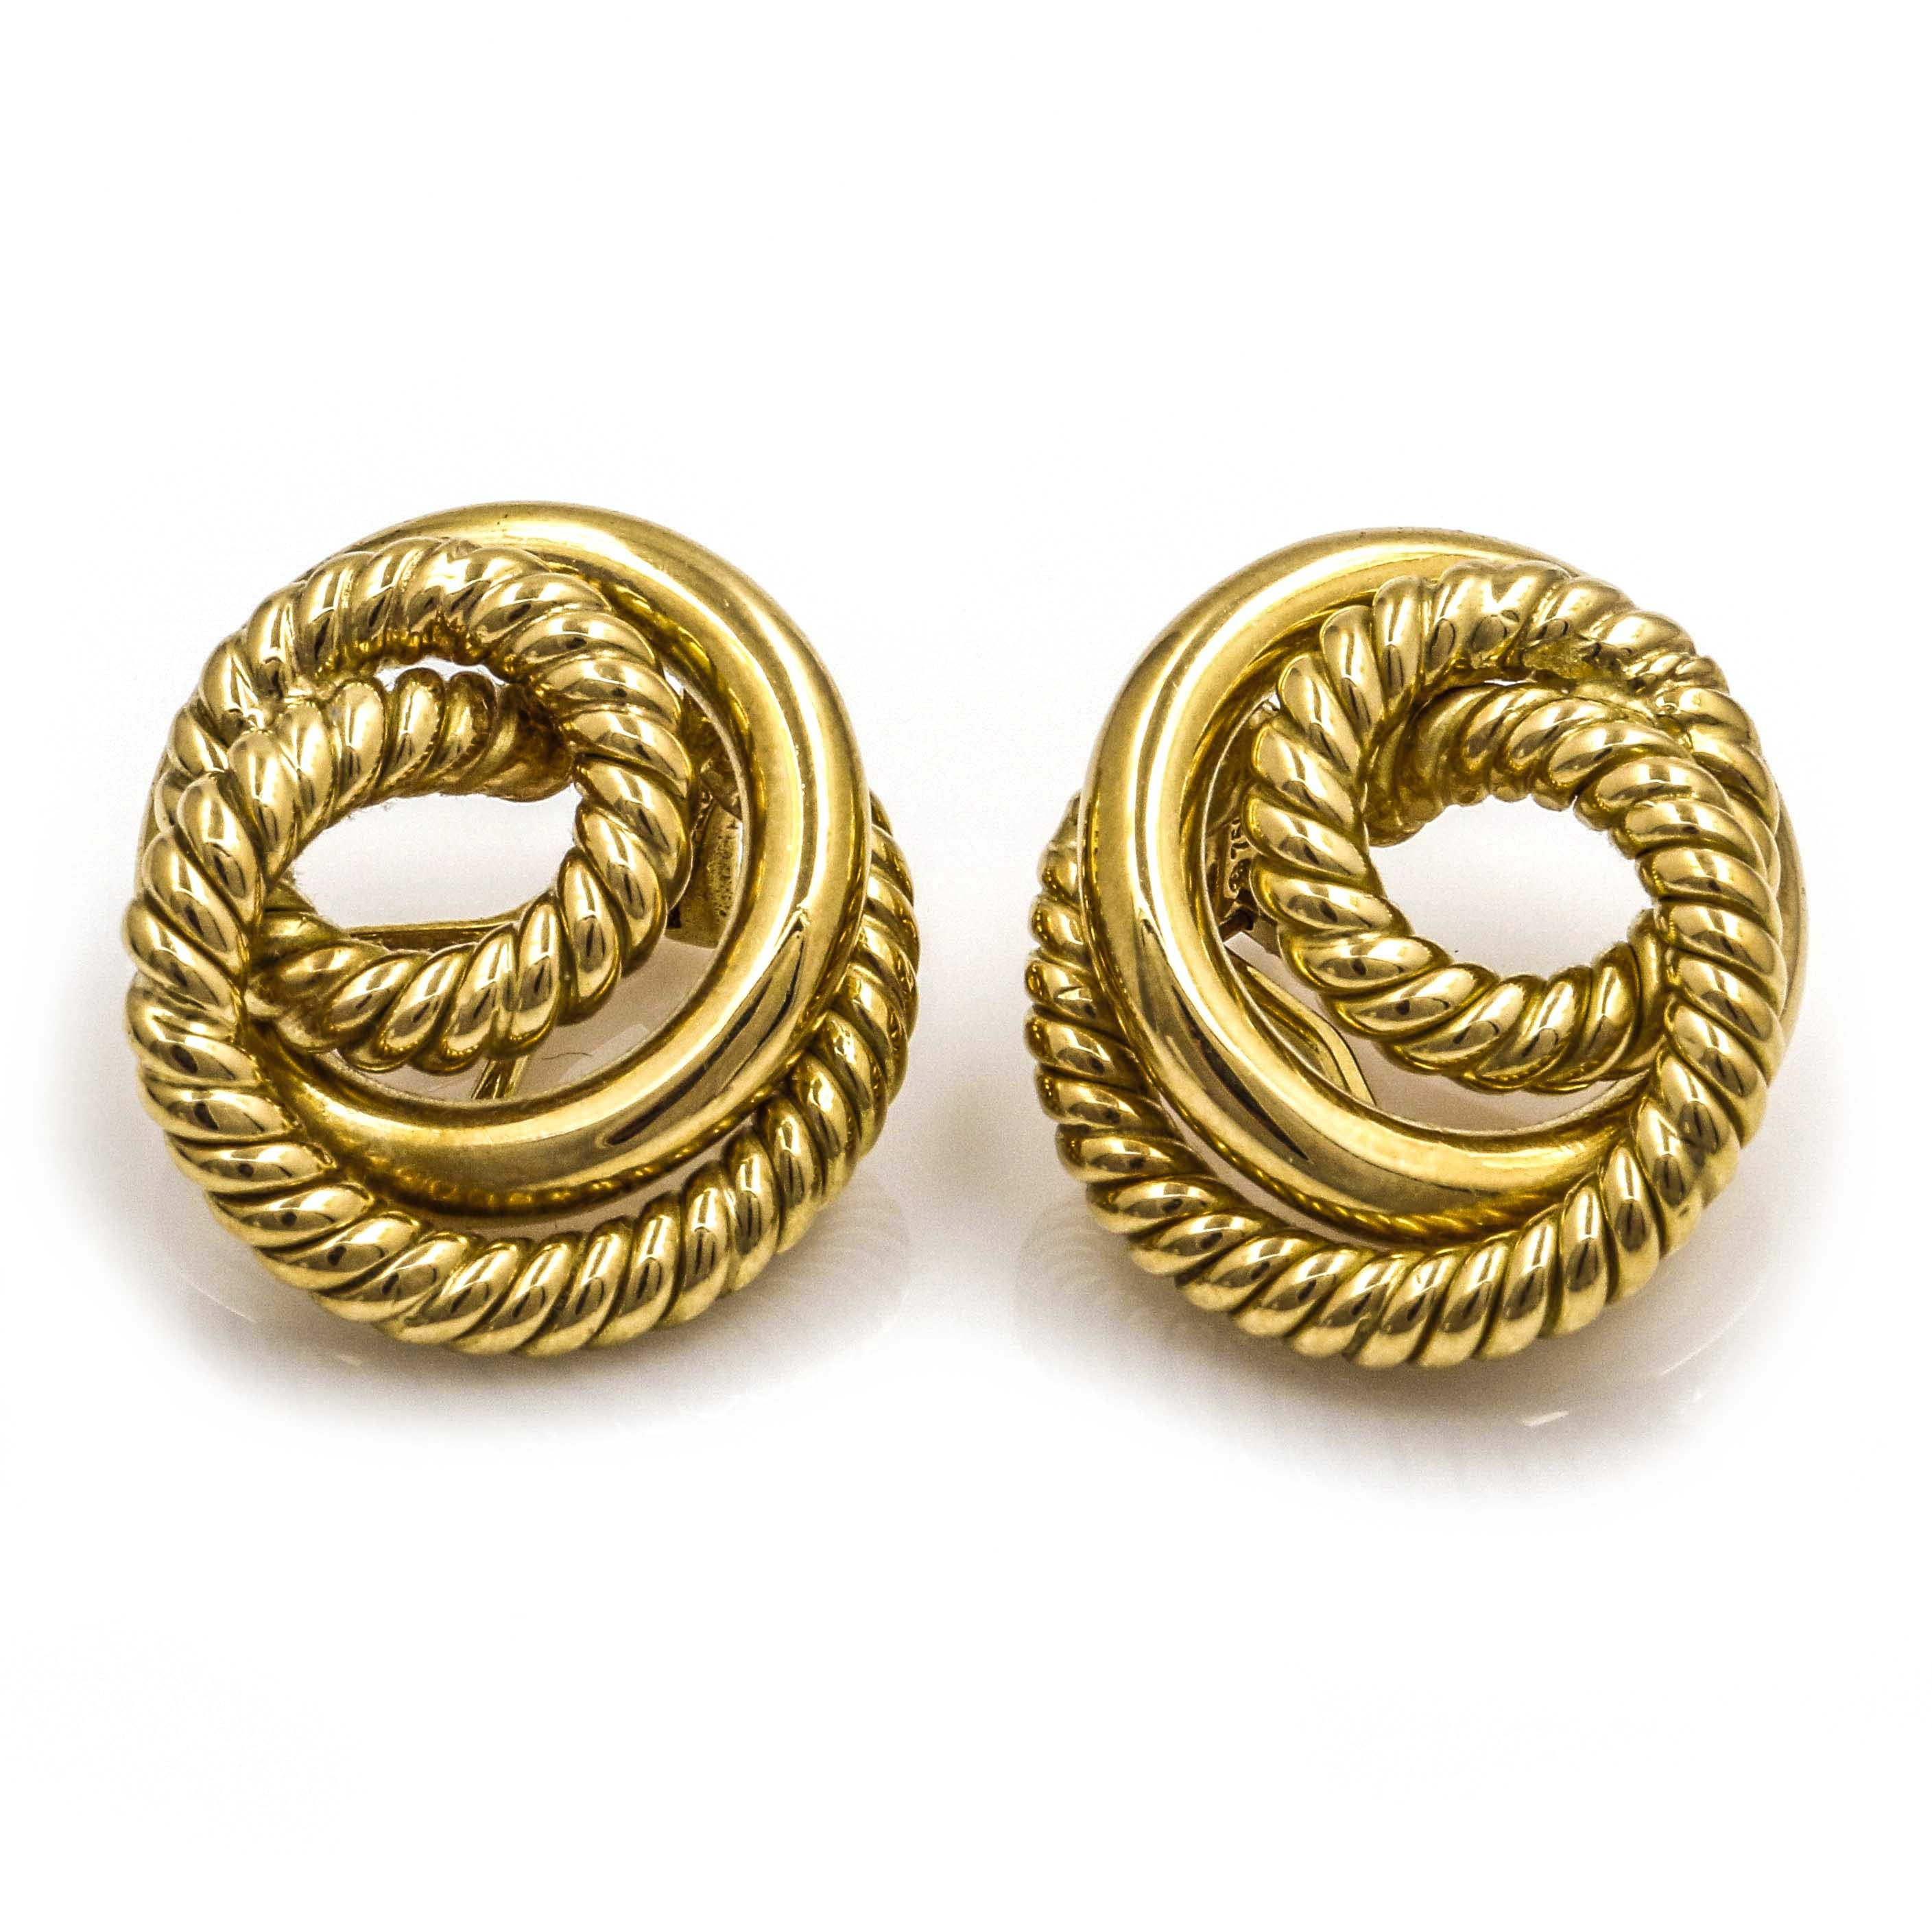 18K Yellow Gold Clip-On Earrings